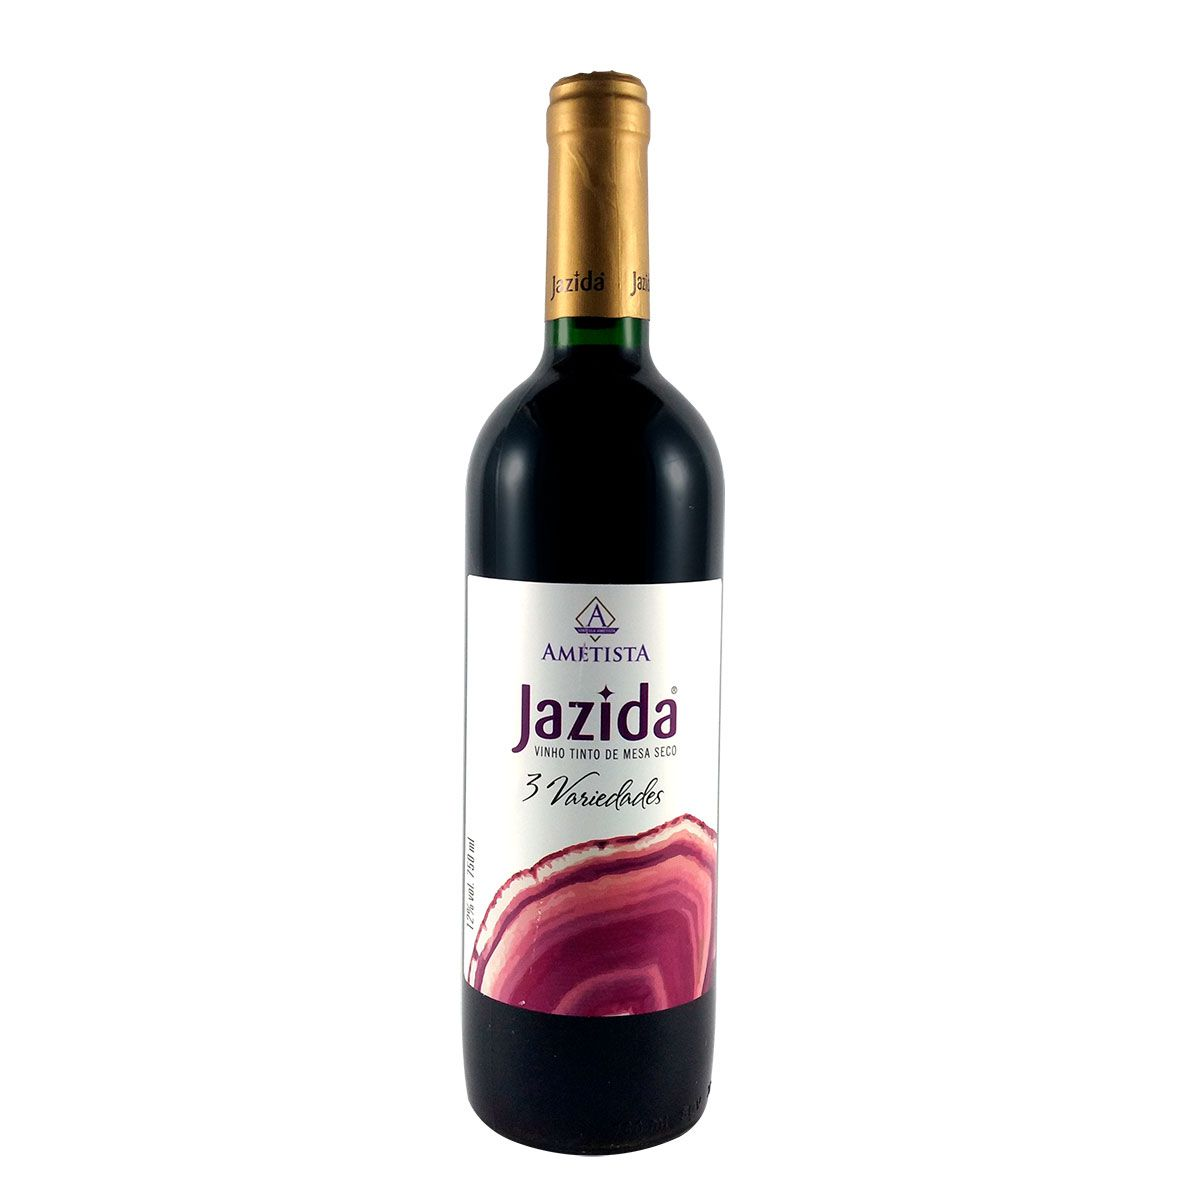 Vinho Tinto de Mesa Seco Jazida 3 Variedades 750ml